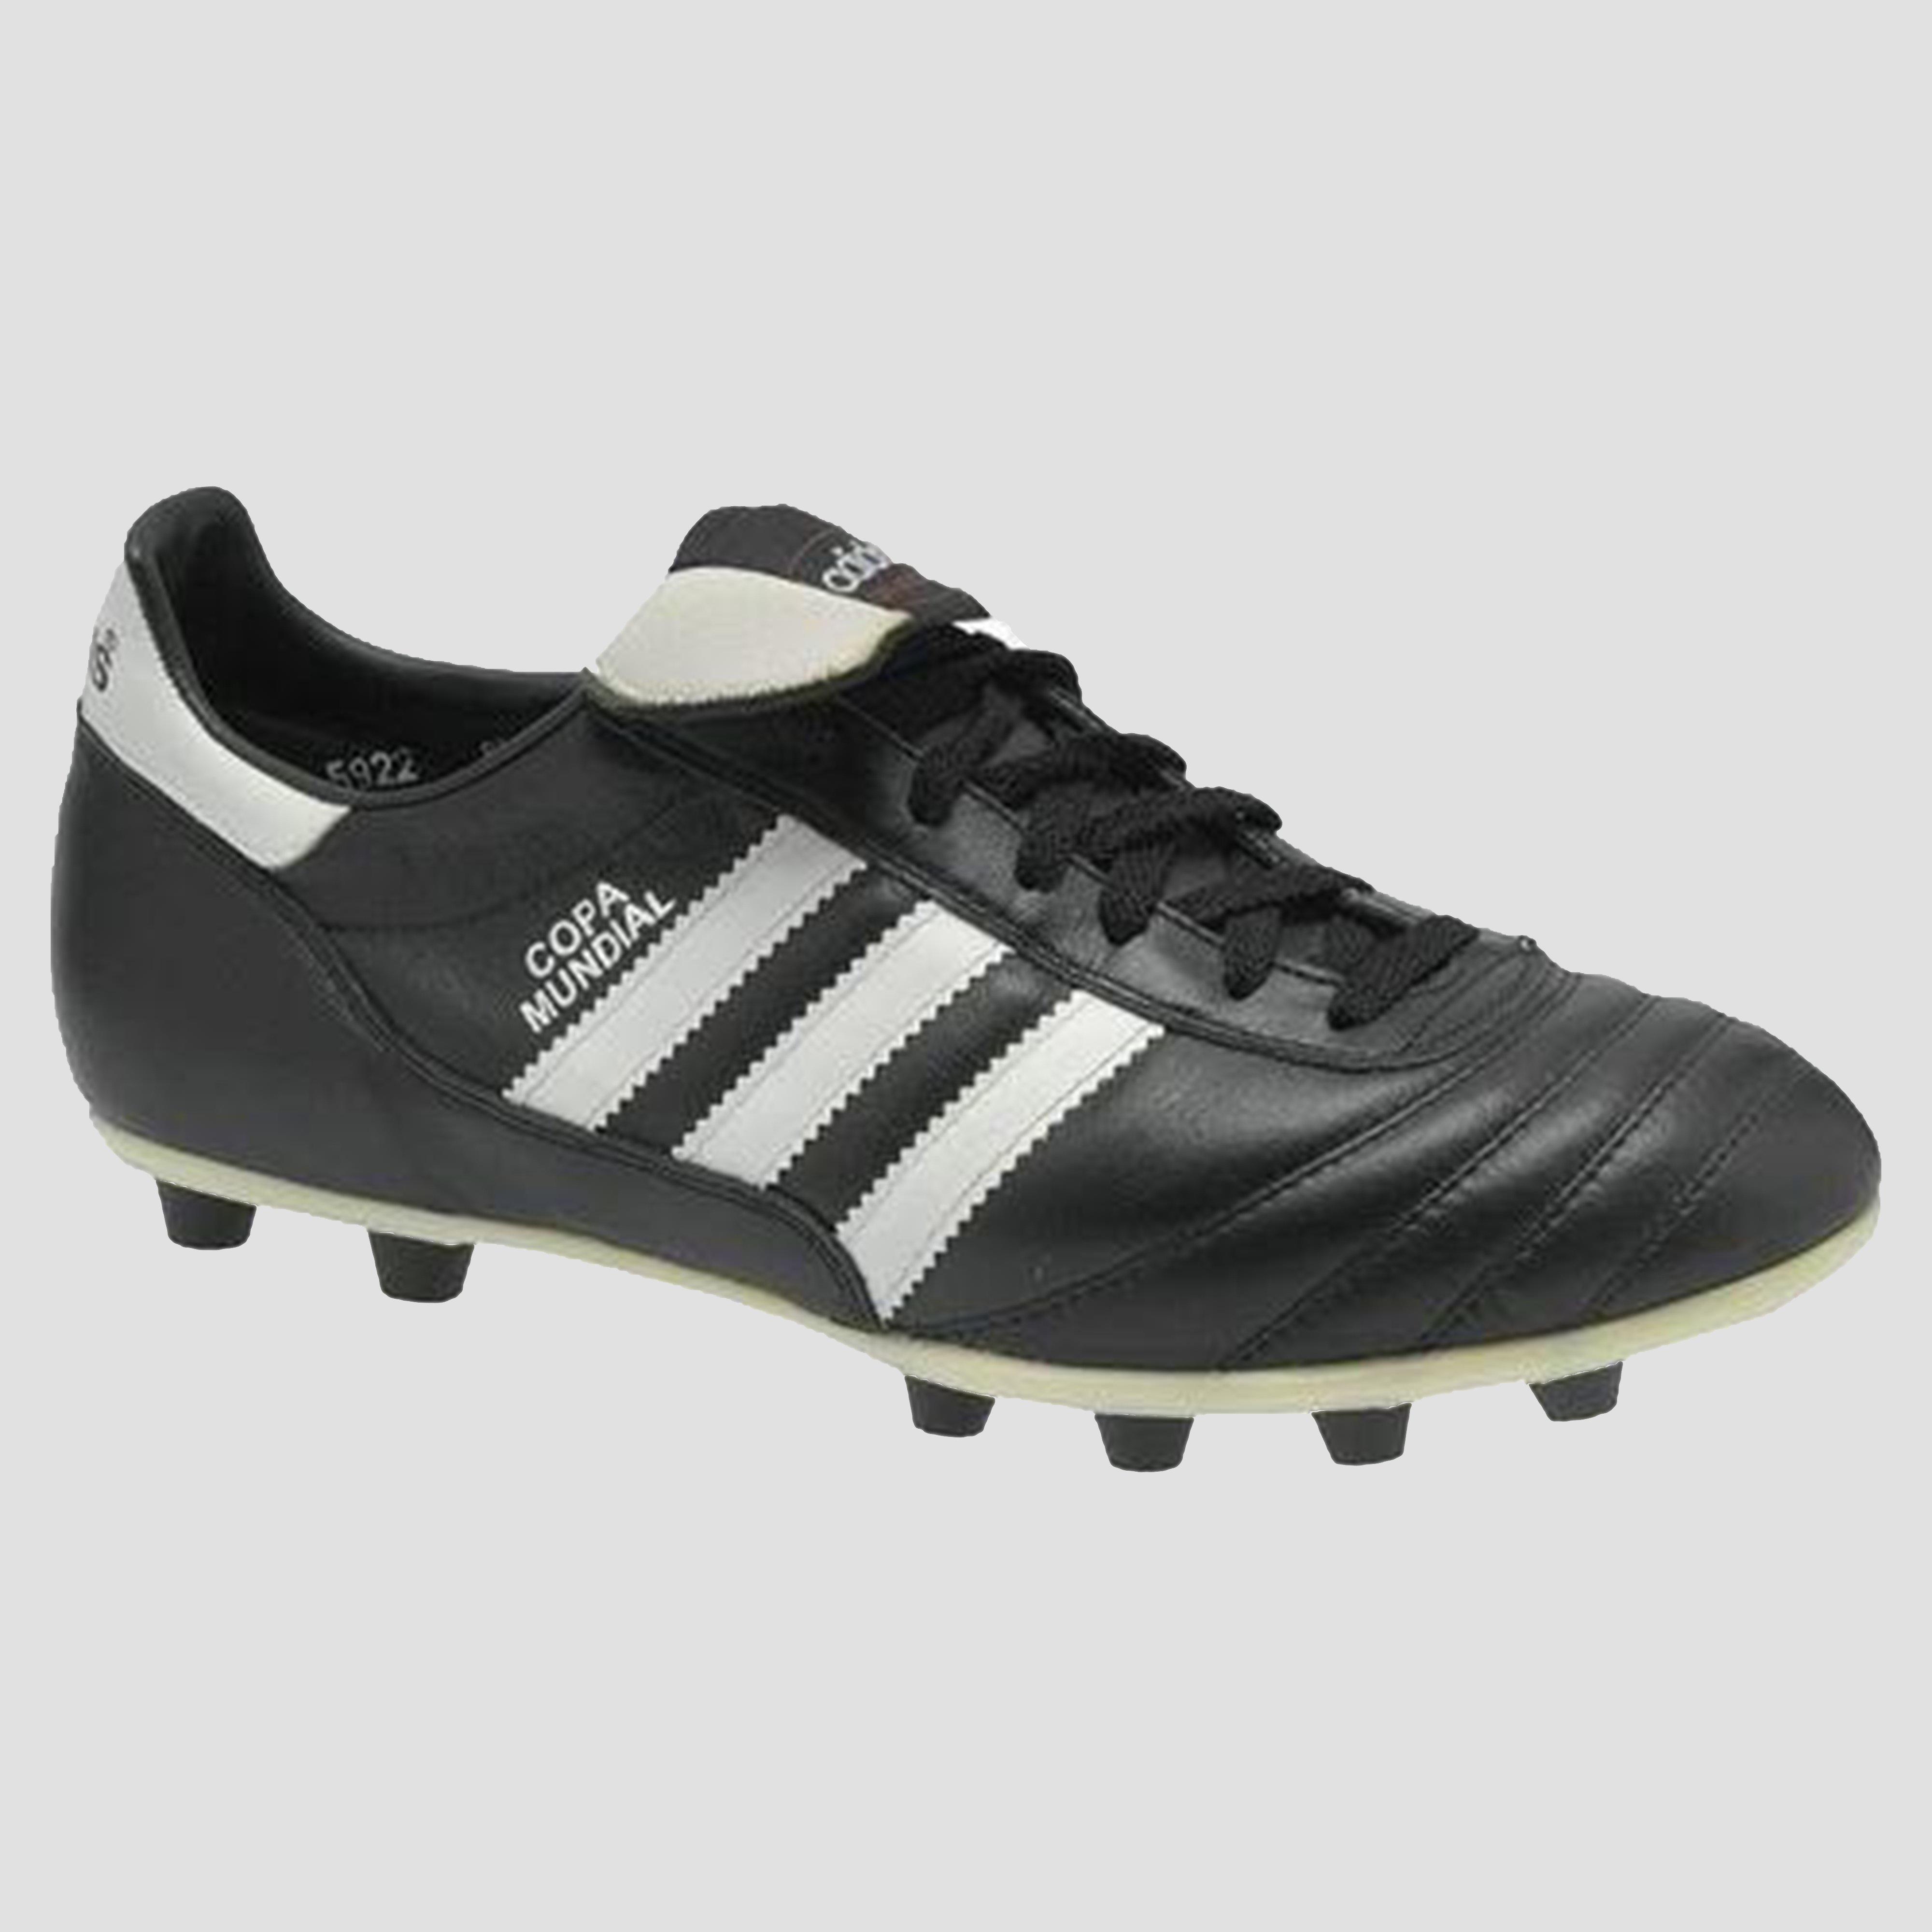 Chaussures Noir Adidas Copa Mundial bZdwtWRH